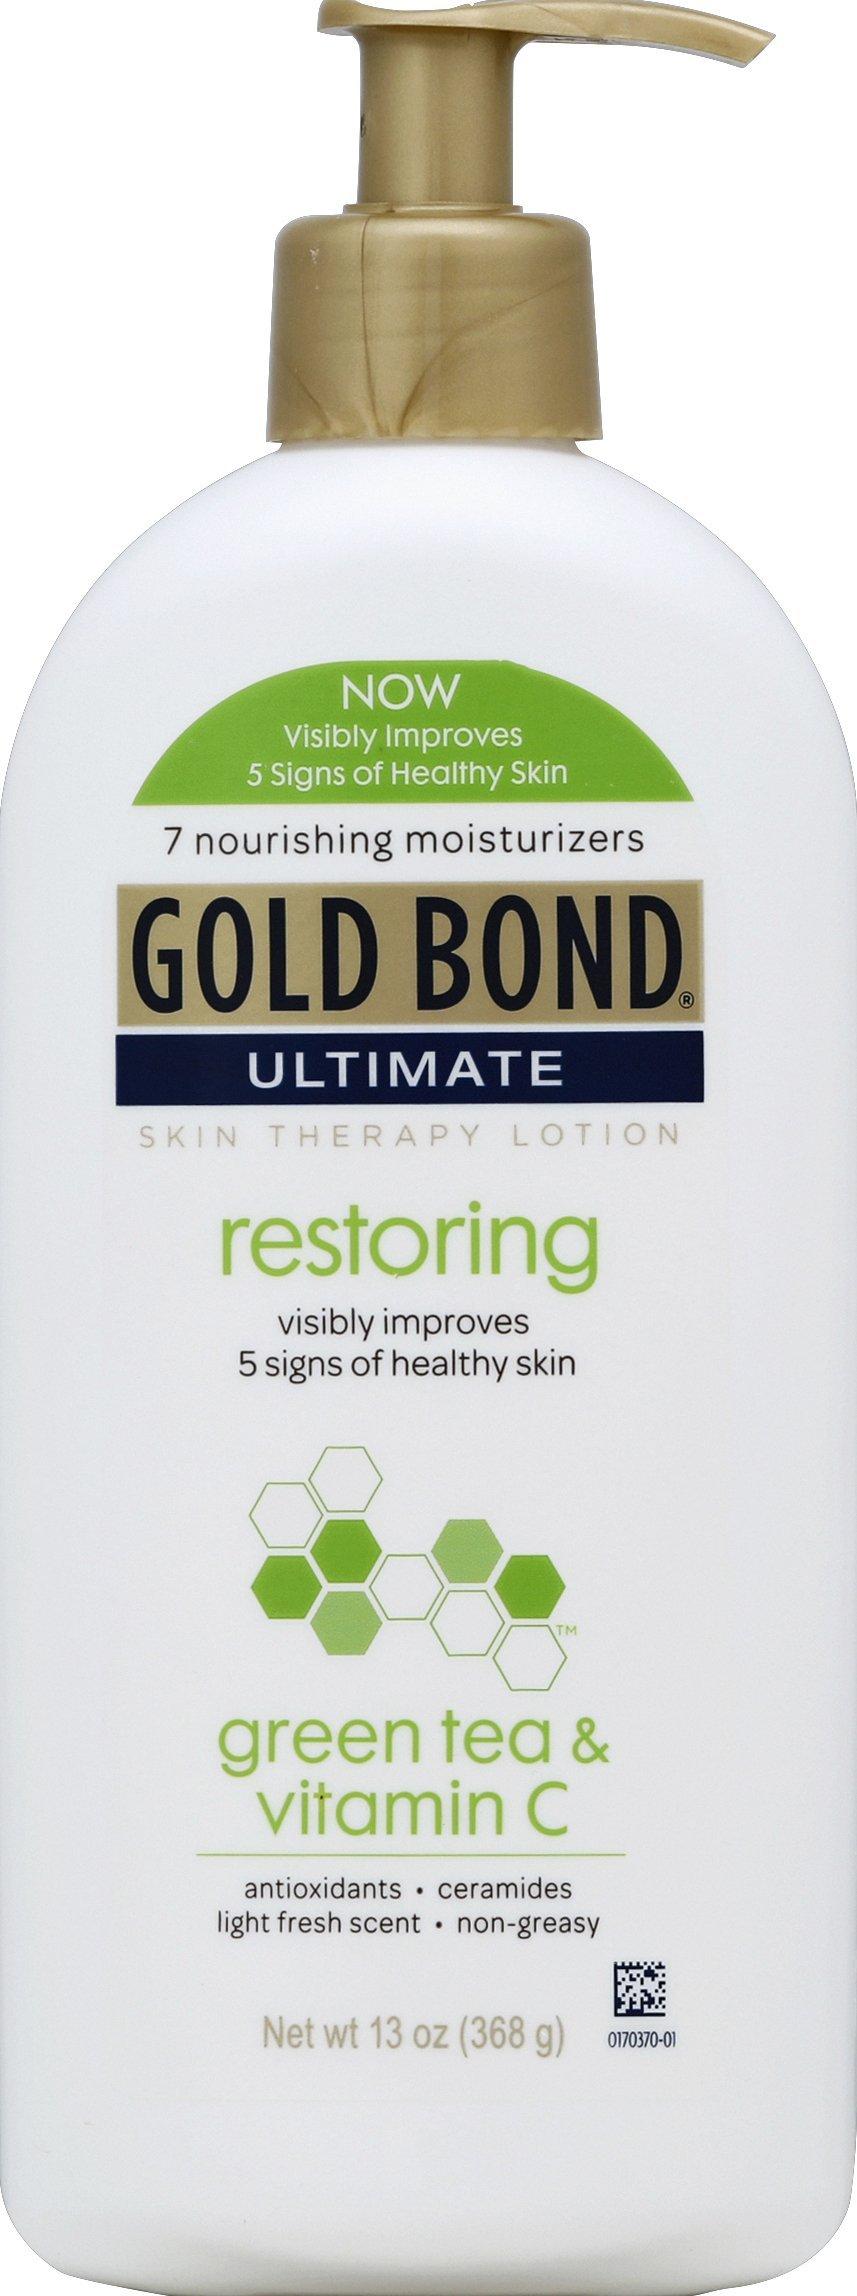 Amazon.com : Gold Bond Ultimate Restoring Skin Therapy